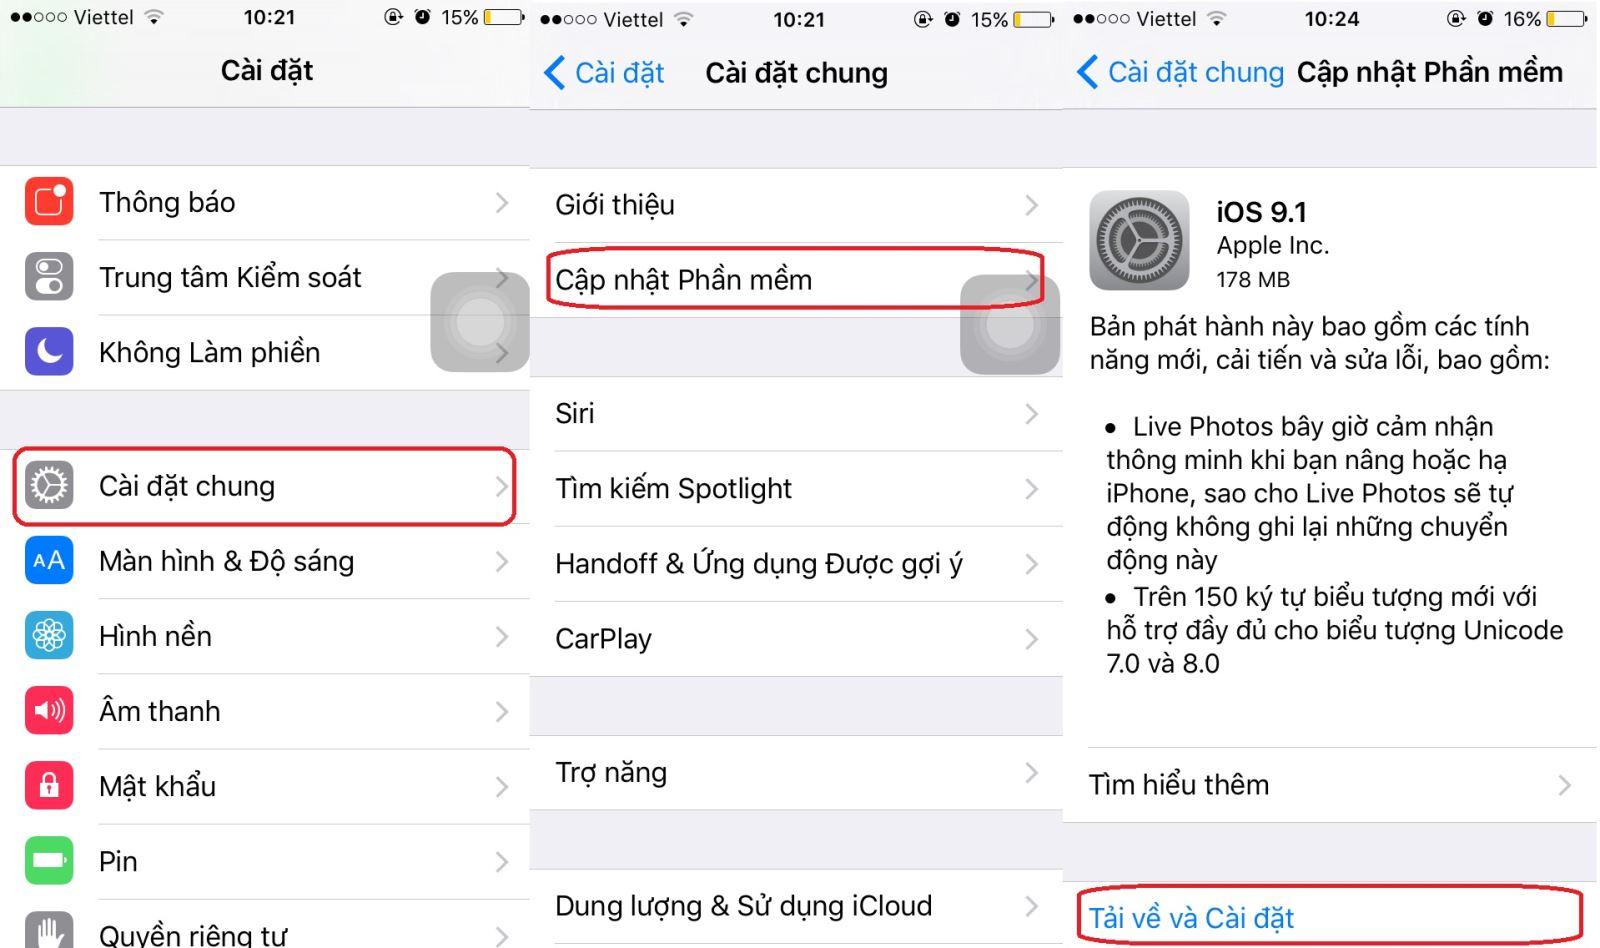 Cập nhật iOS 9.1 thông qua OTA